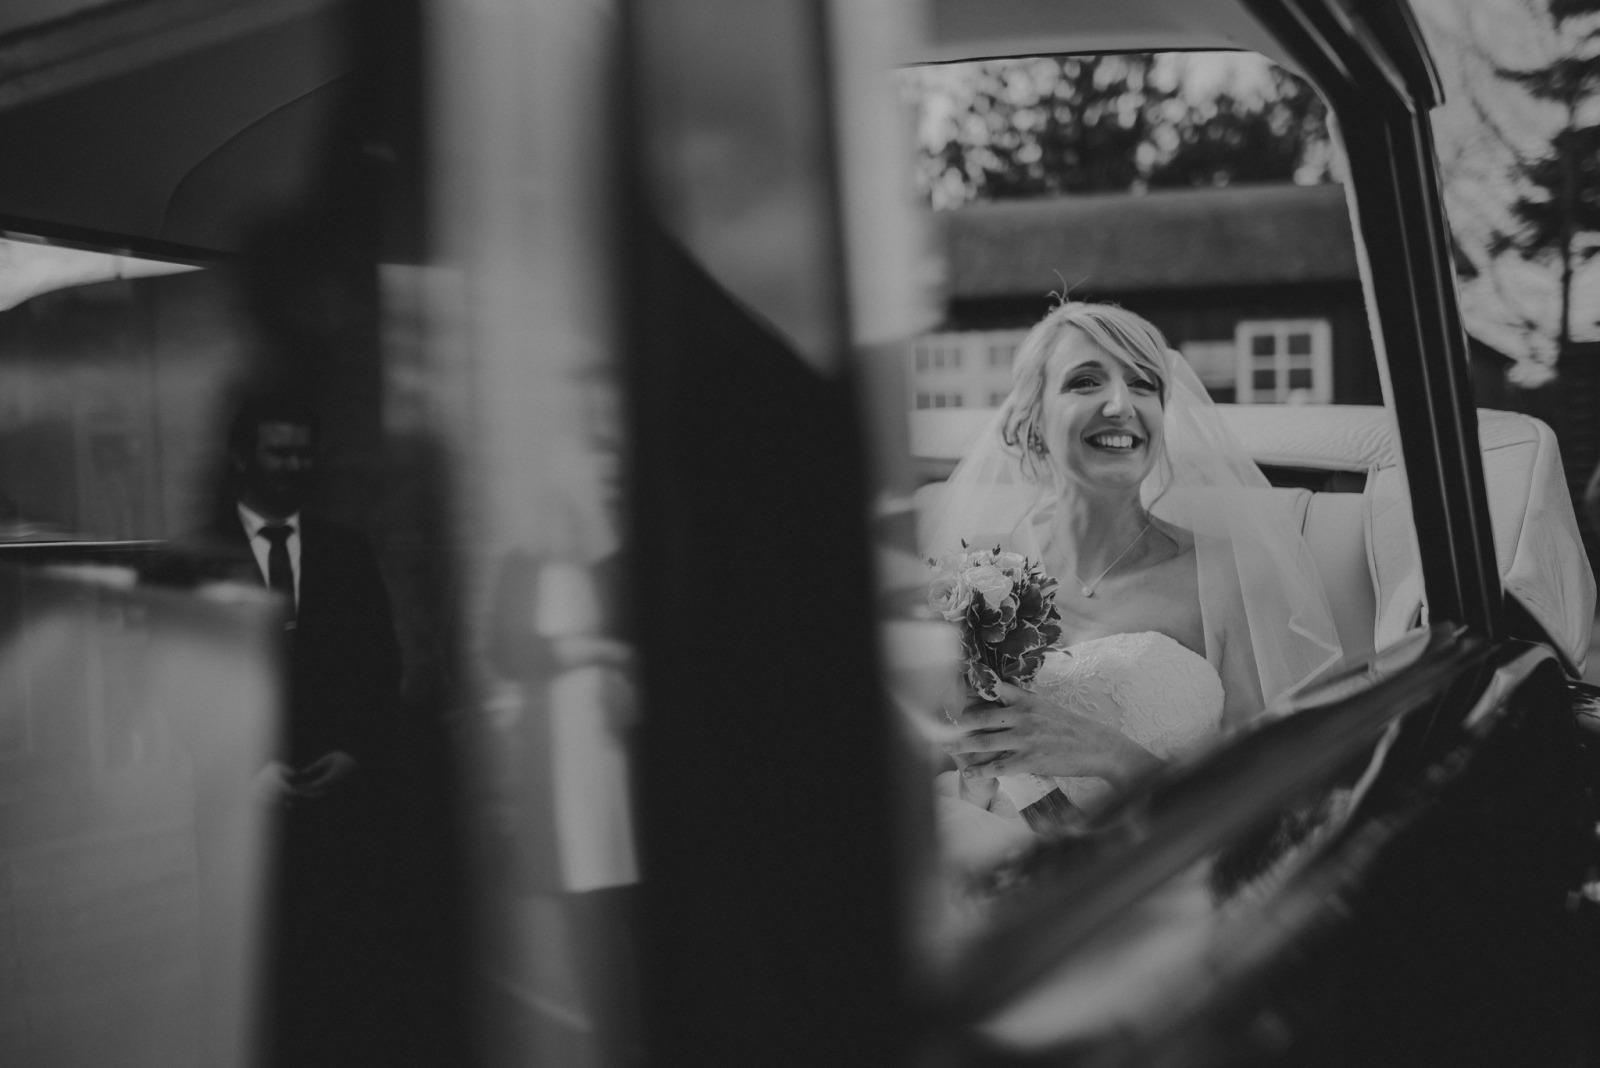 forbes-of-kingennie-wedding-158-of-504